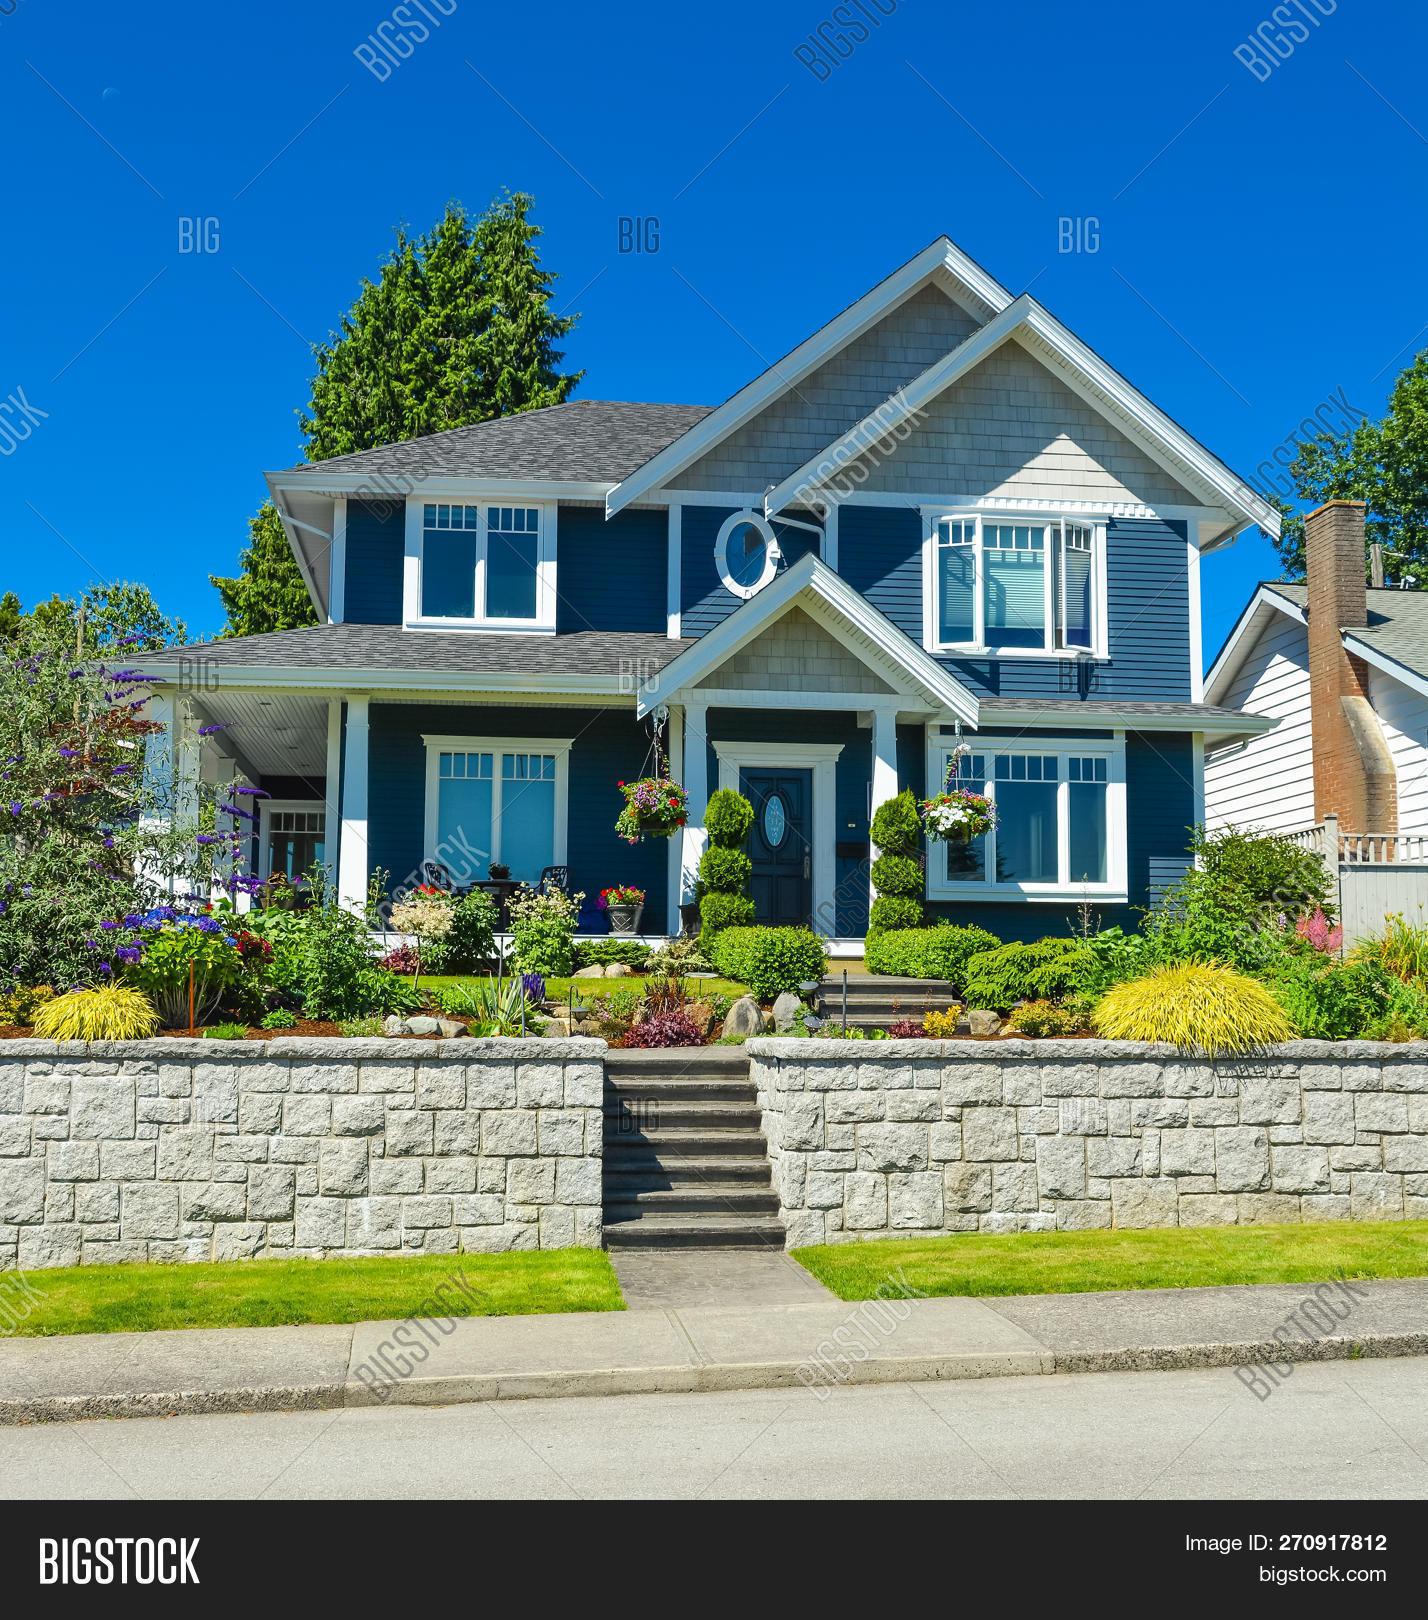 Luxury Family House Image Photo Free Trial Bigstock